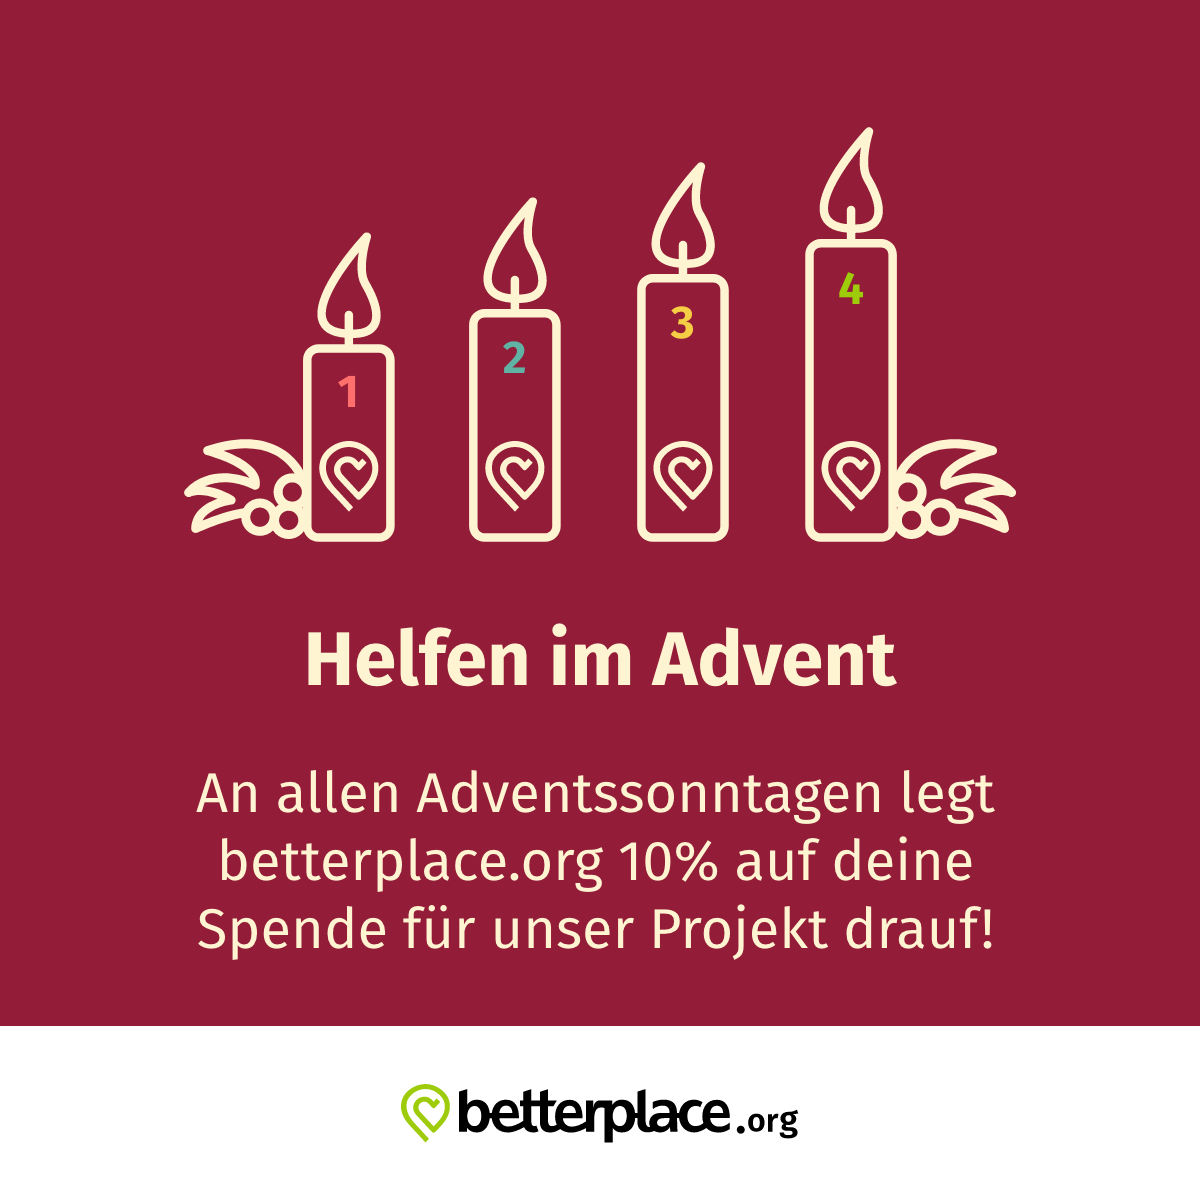 betterplace Adventskranz share